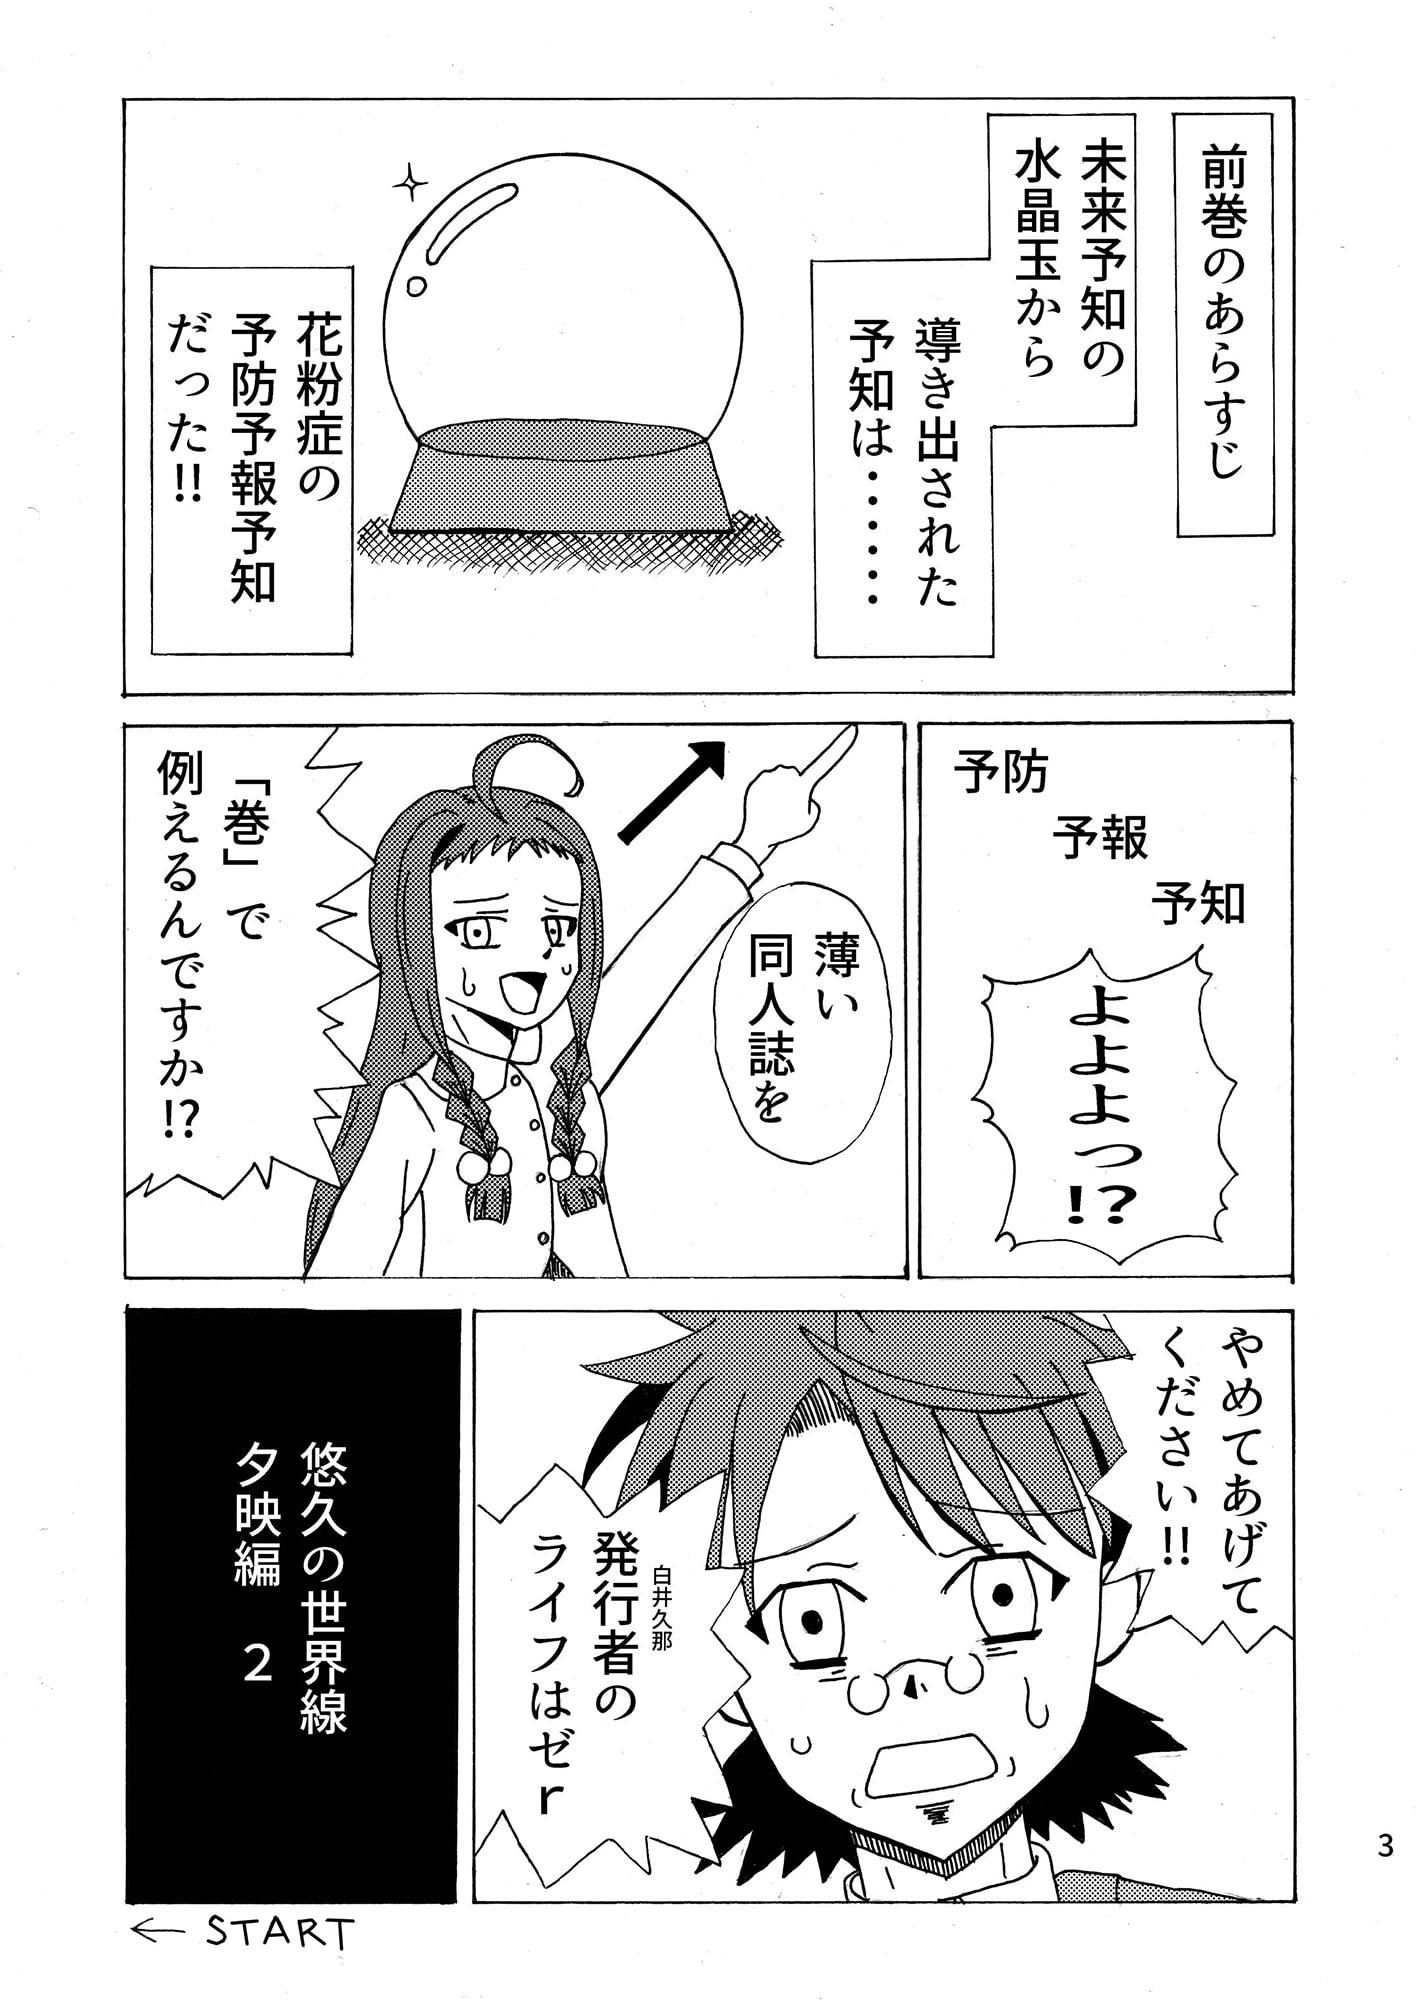 悠久の世界線 夕映編2